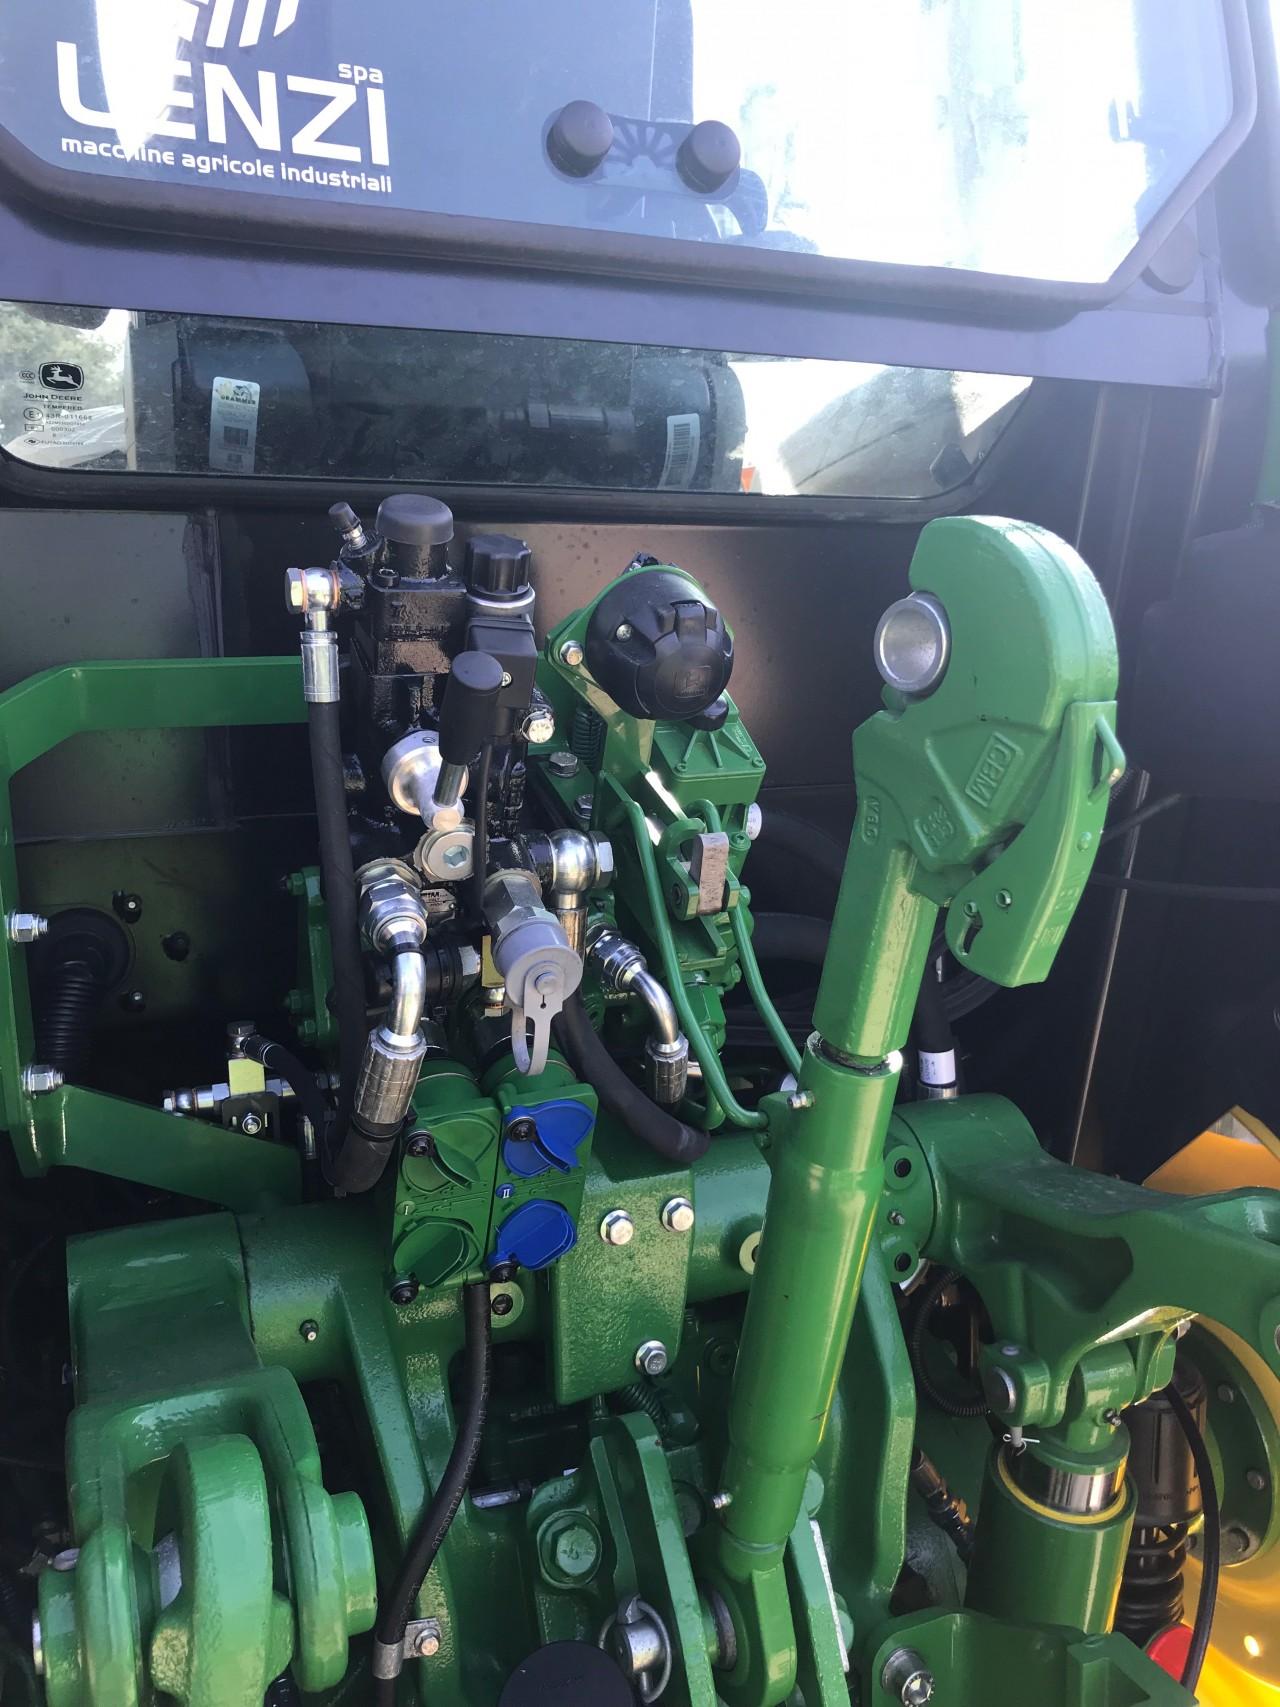 impianto-frenatura-idraulico-modello-john-deere-5115r-1.jpg